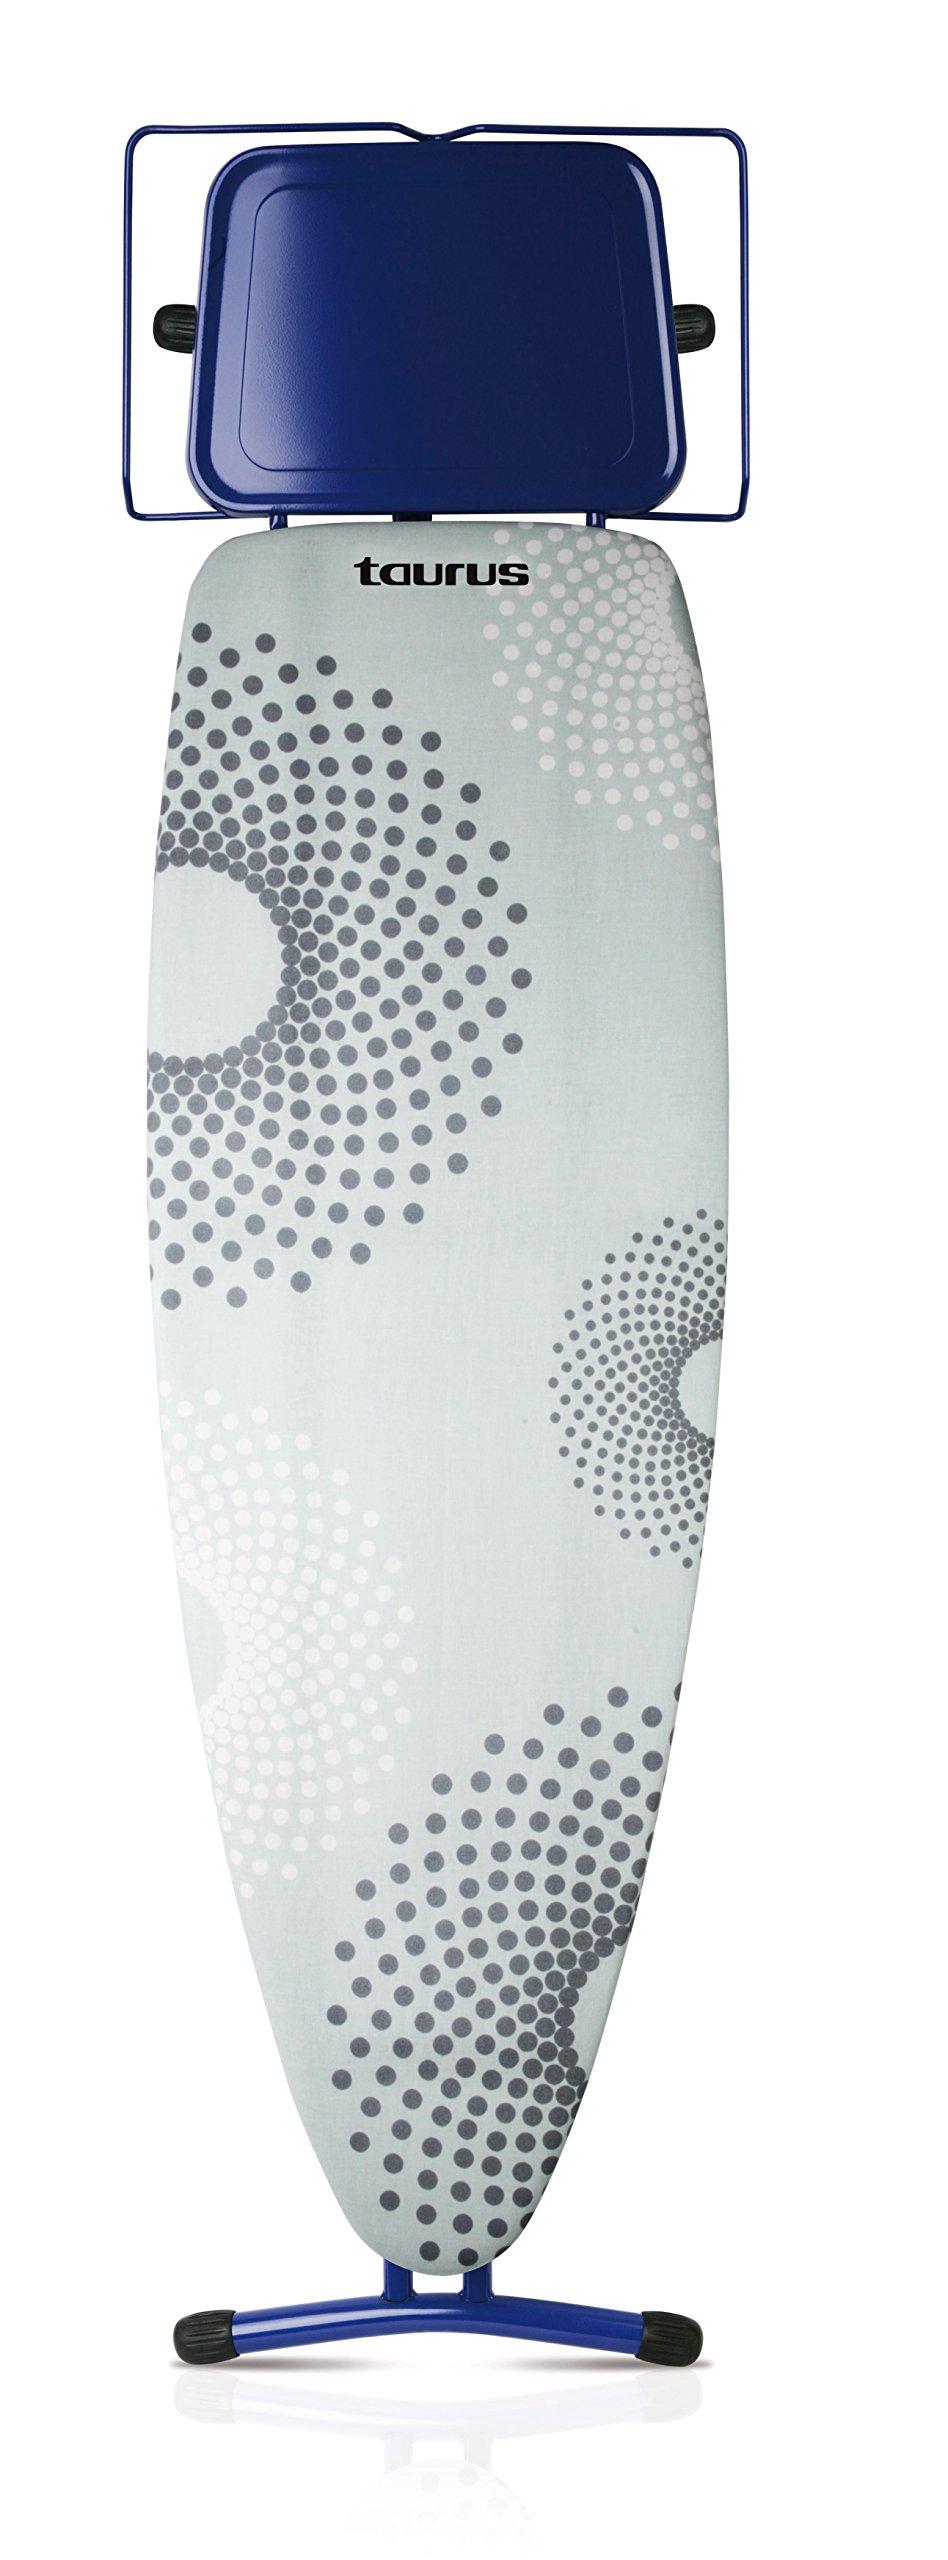 Taurus Argenta Tabla de Planchar, 124 x 40 cm product image